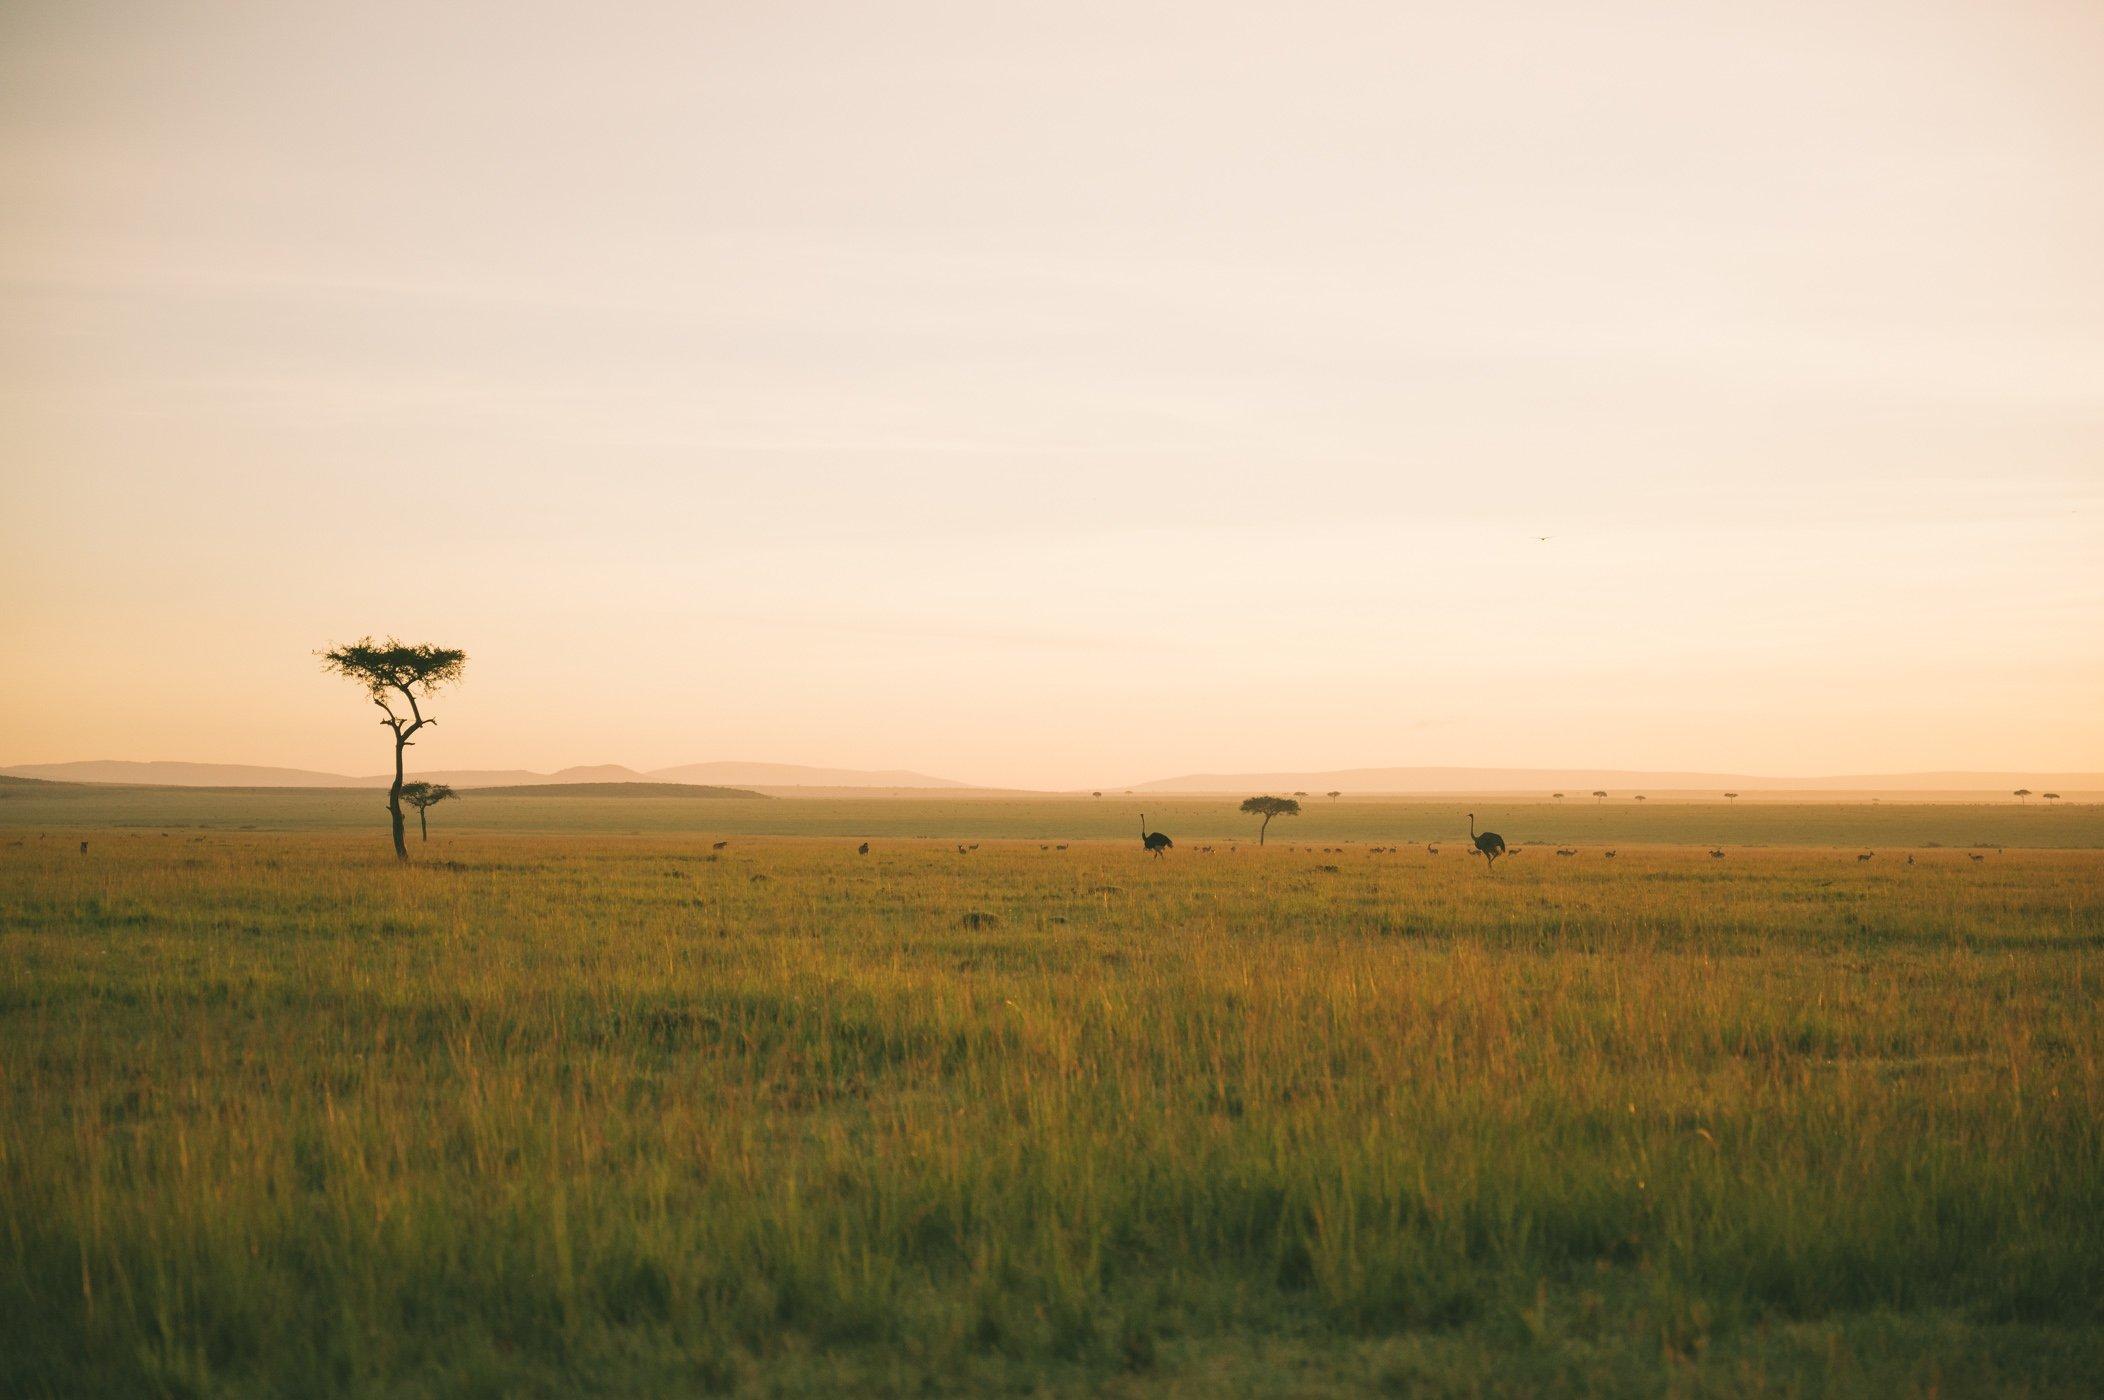 The plains of the Maasai Mara in Kenya in January